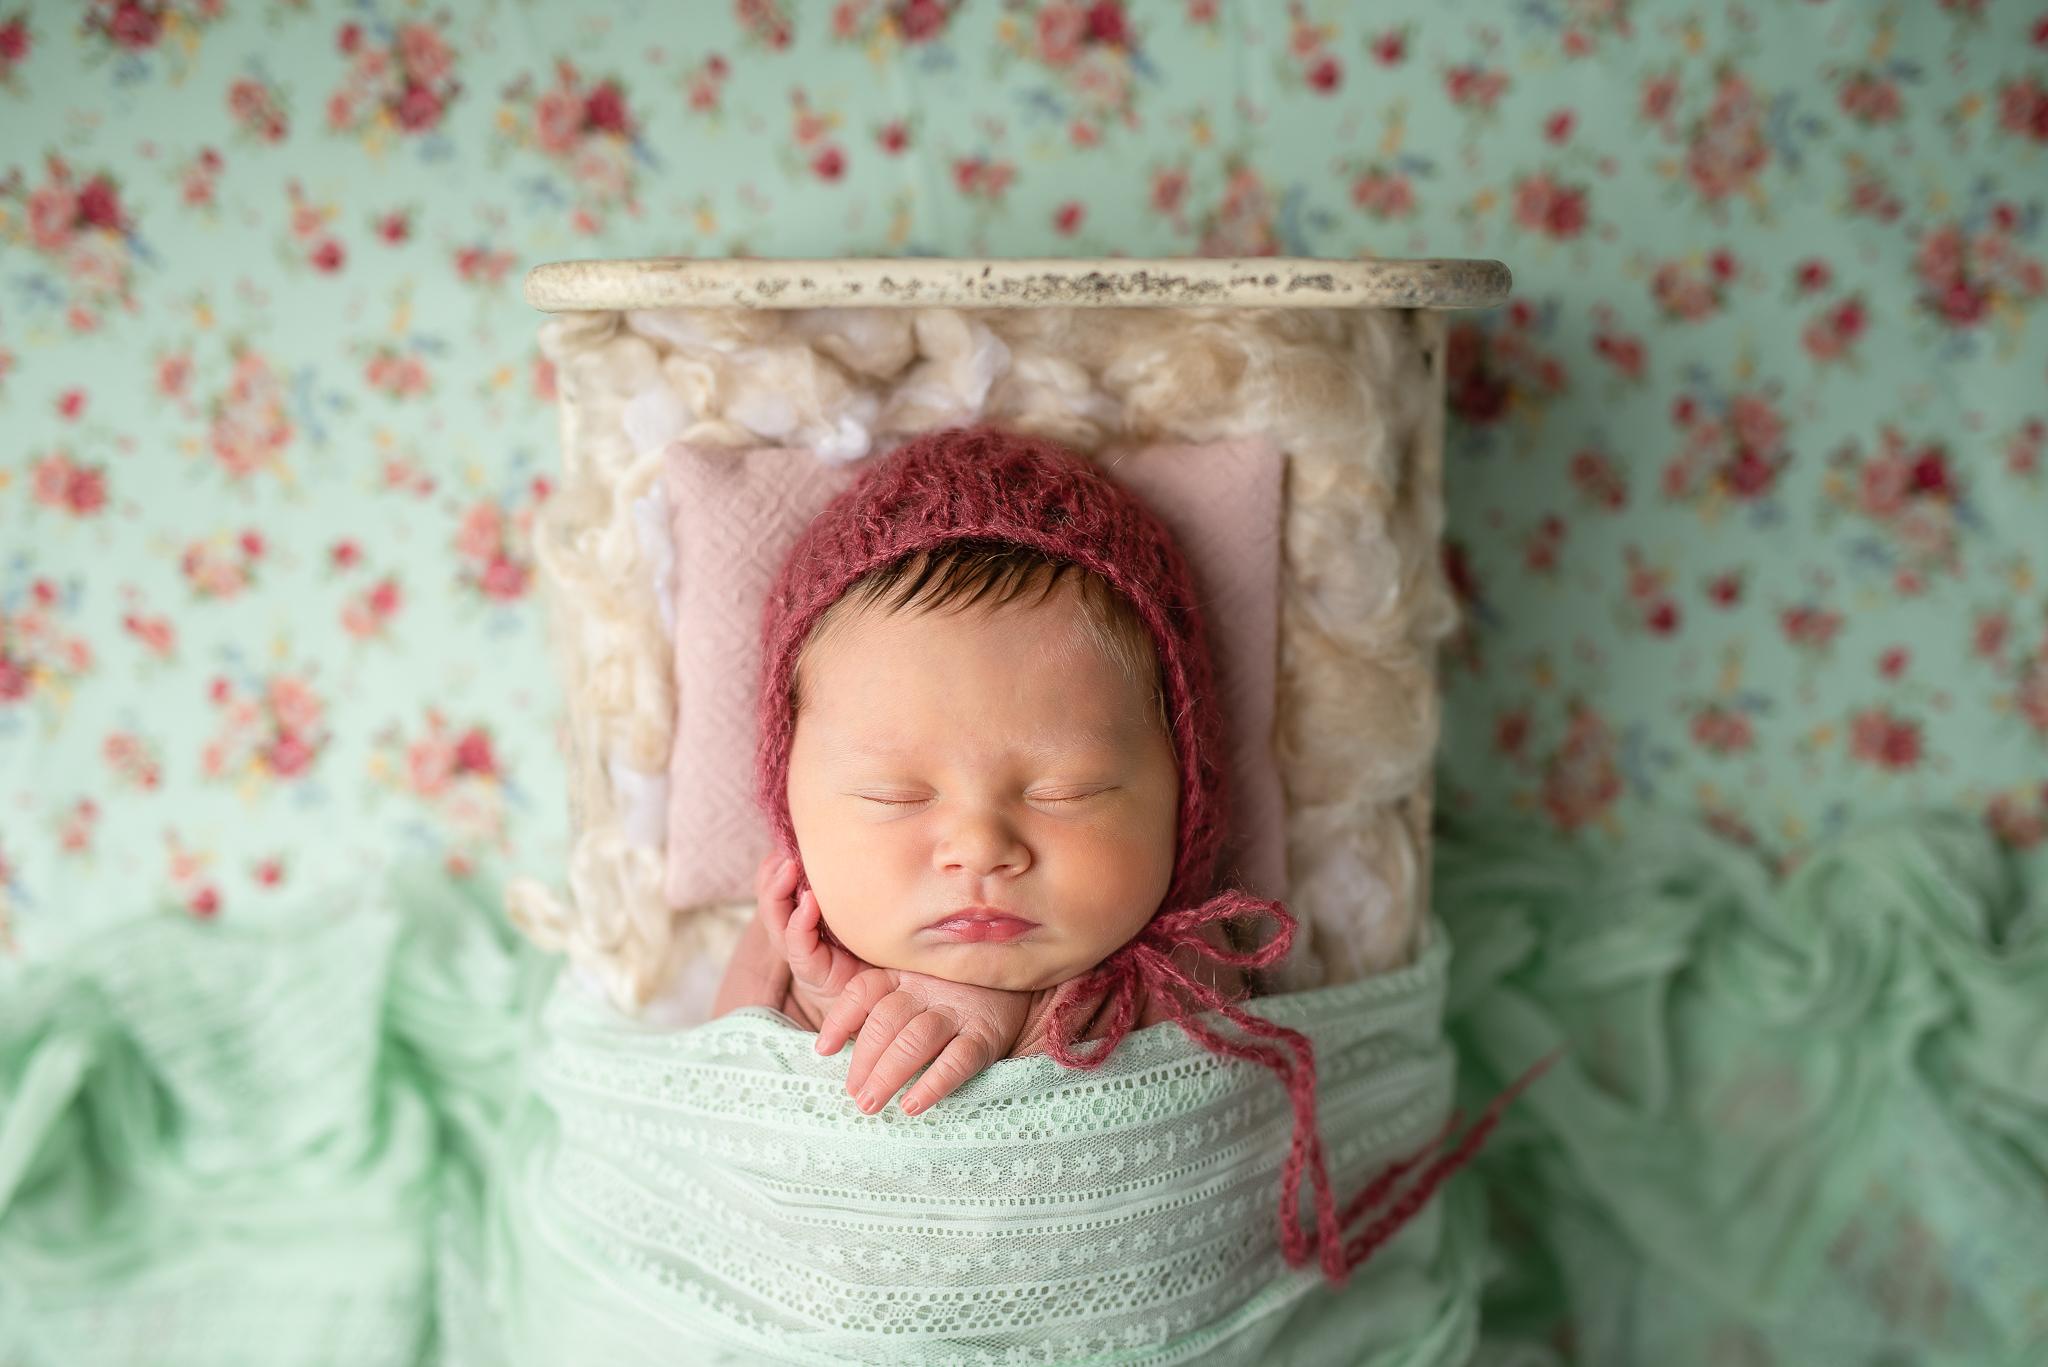 Newborn95NaomiLuciennePhotography062019-2-Edit.jpg